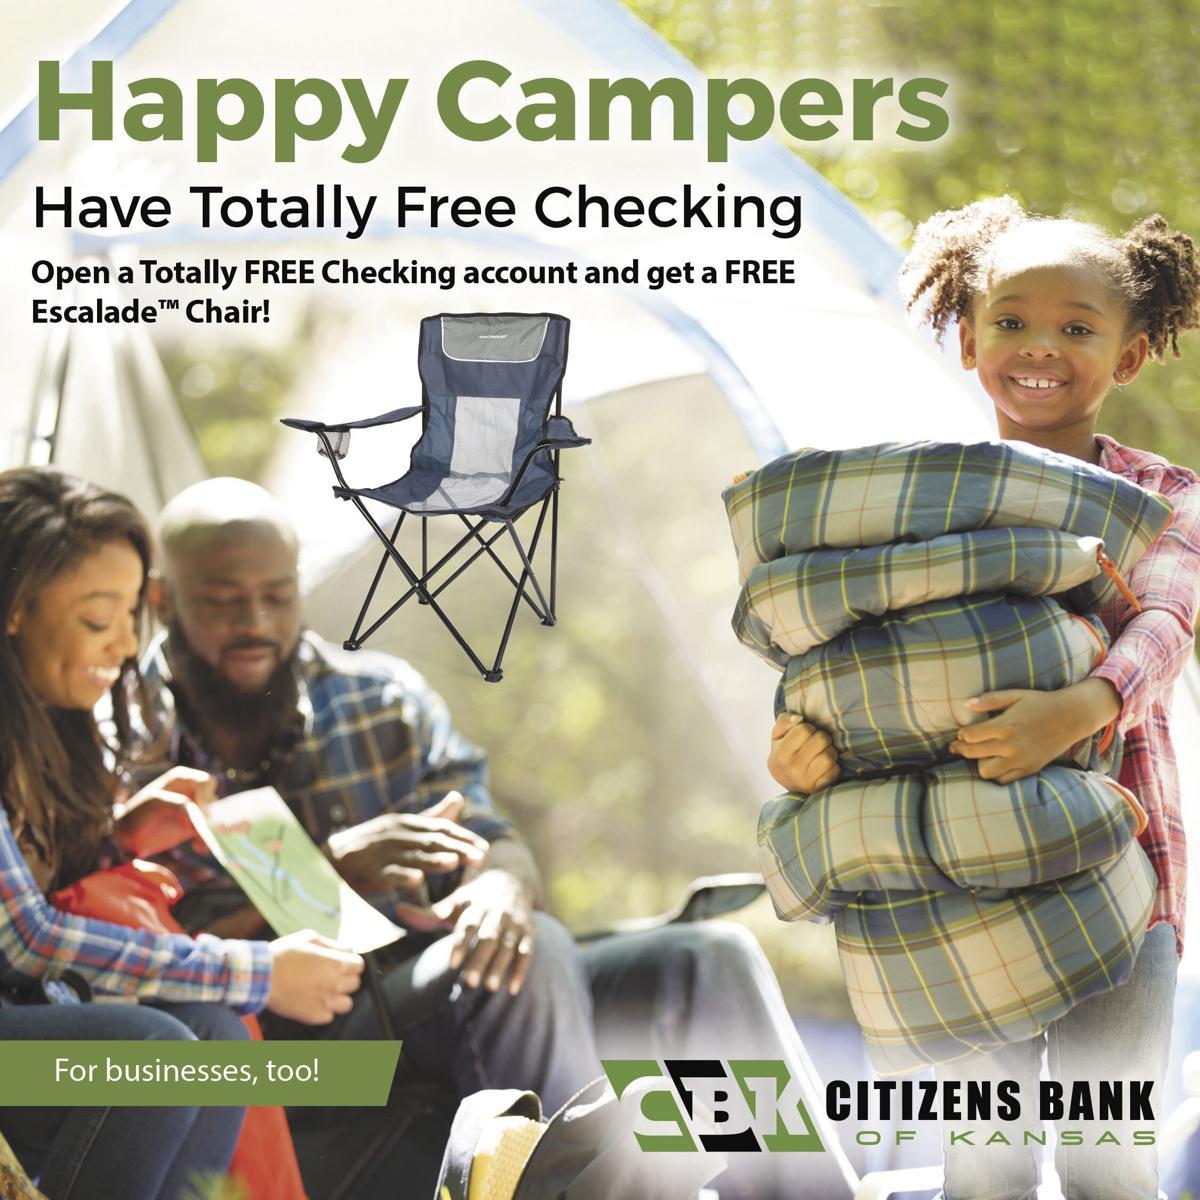 Citizen's Bank of Kansas